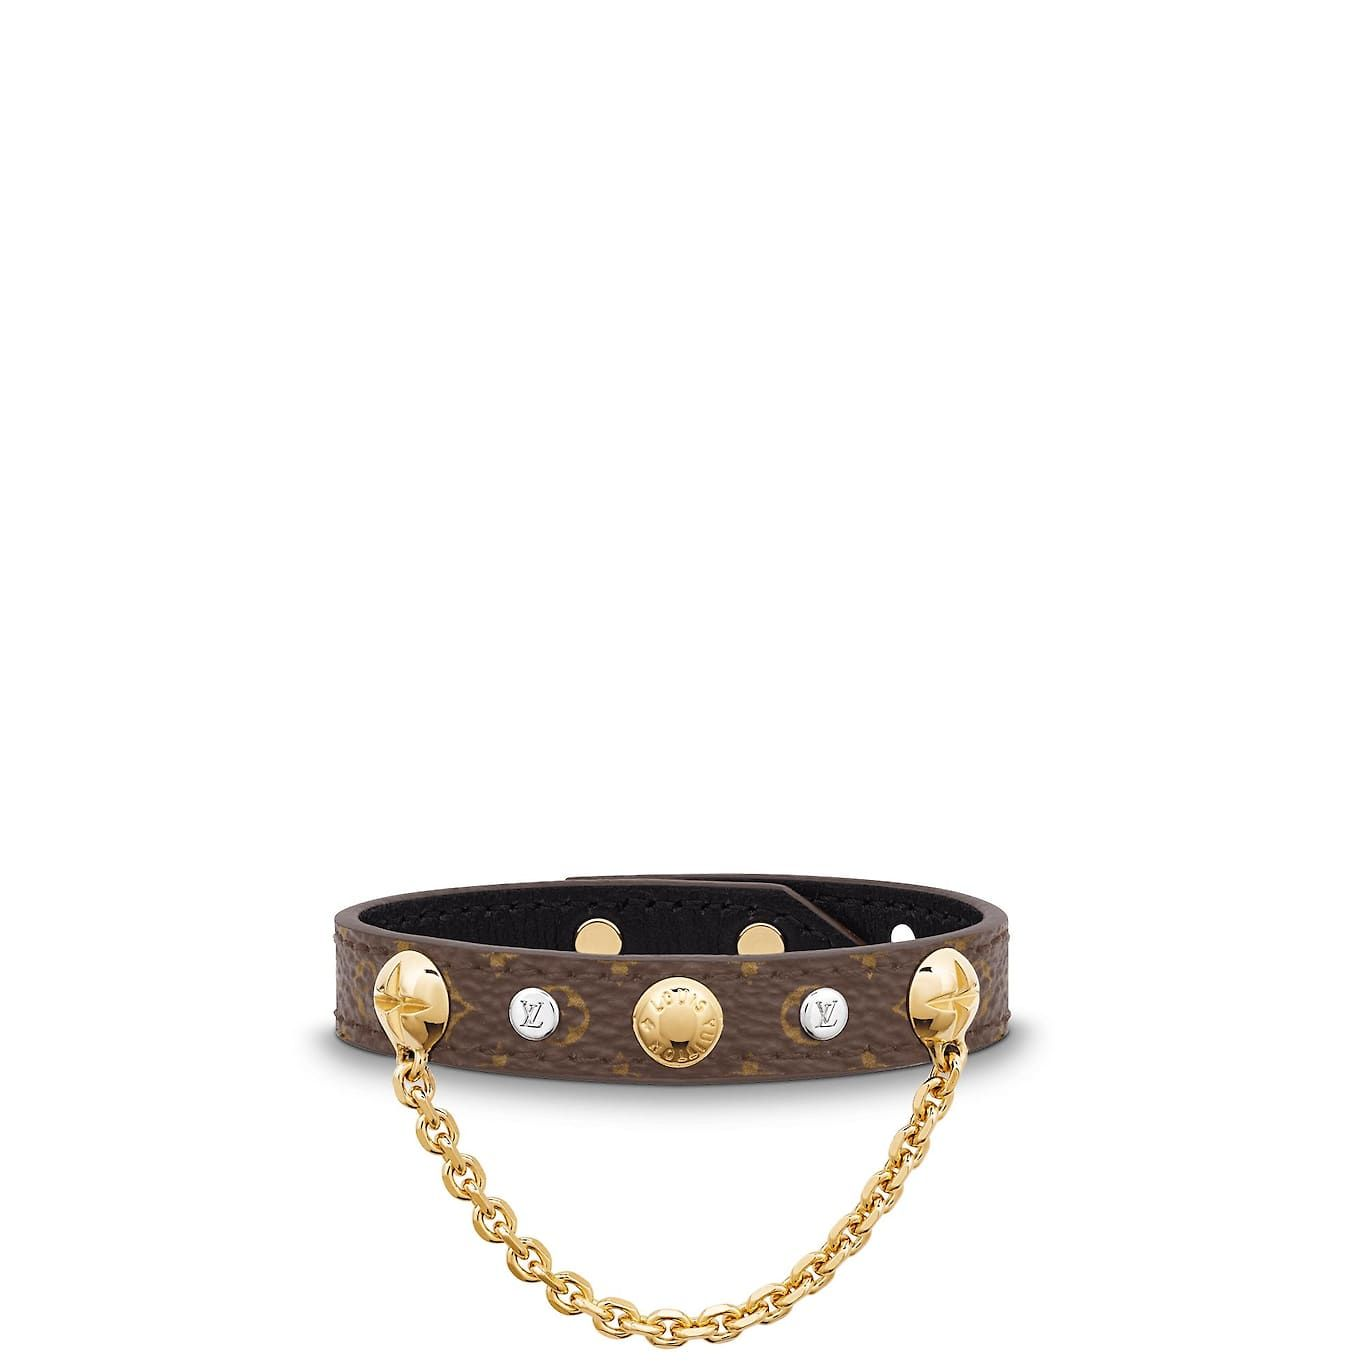 Monogram Accessories Leather Bracelets Lv Harajuku Bracelet Louis